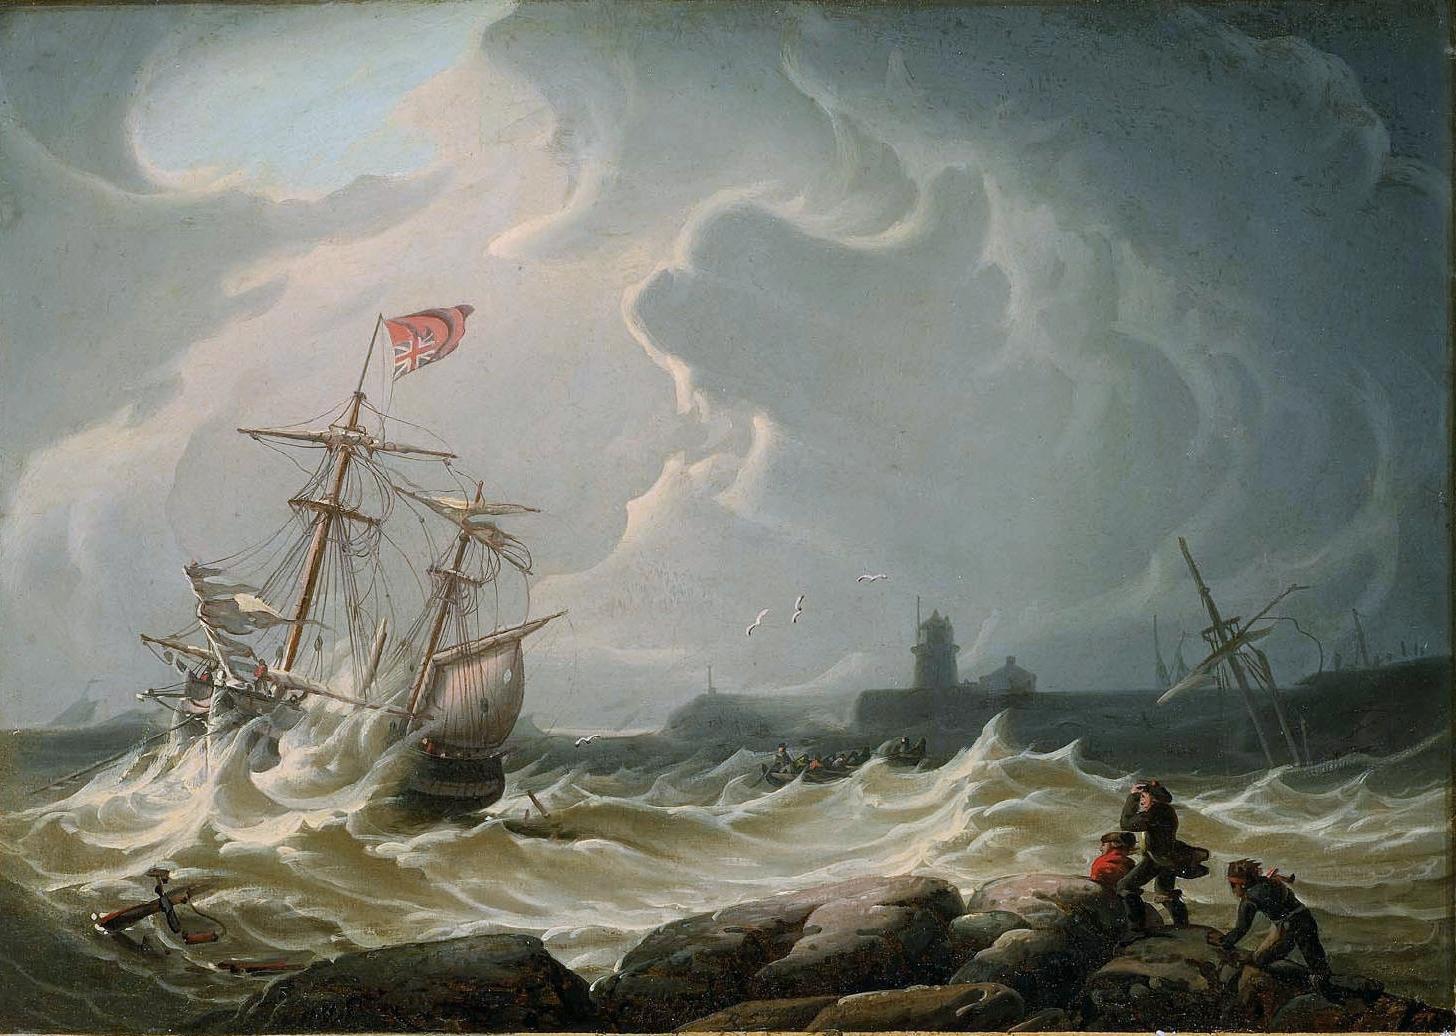 Worksheet Ship In A Storm filerobert salmon ship in storm jpg wikimedia commons jpg